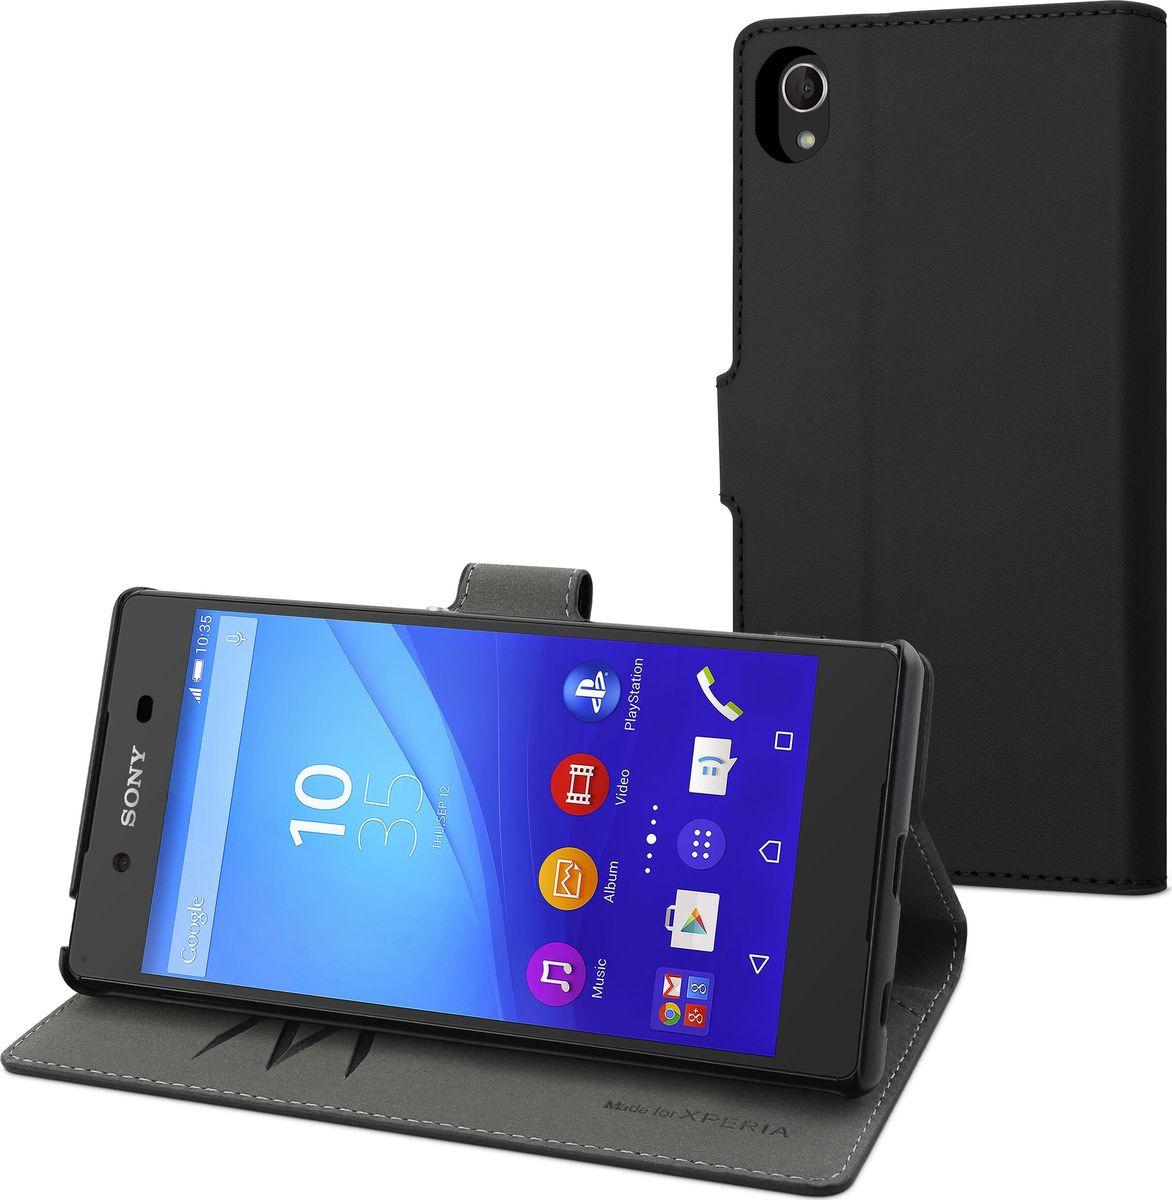 Чехол для сотового телефона Muvit MFX Wallet Folio Case для Sony Xperia Z3+, SEWAL0013, черный чехол книжка gresso канцлер для sony xperia xa ultra черный